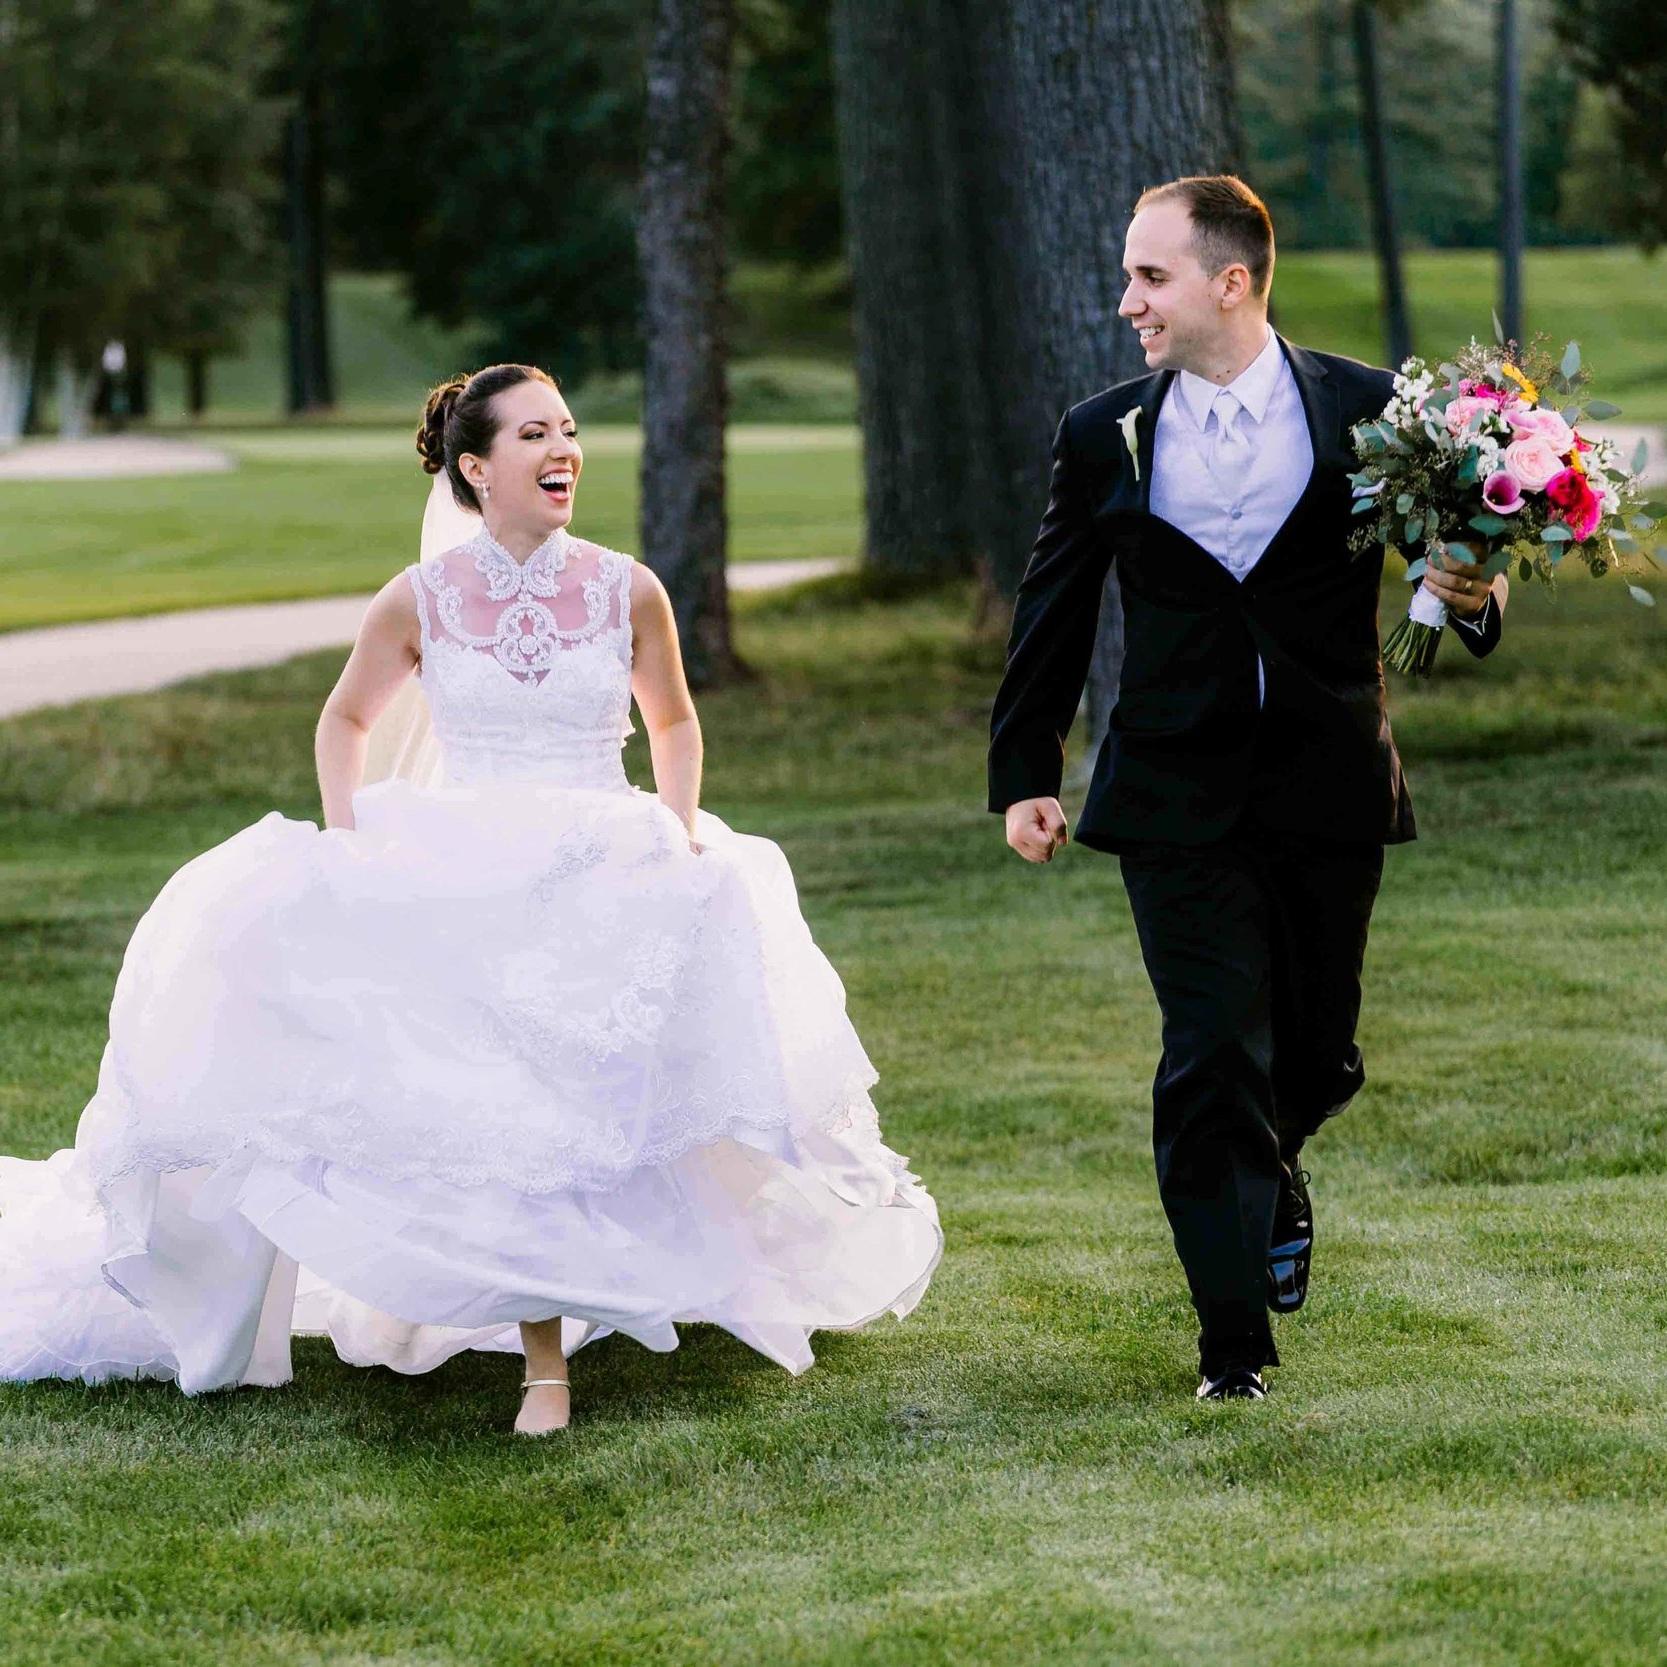 08-25-17_Estes Wedding_474.jpg